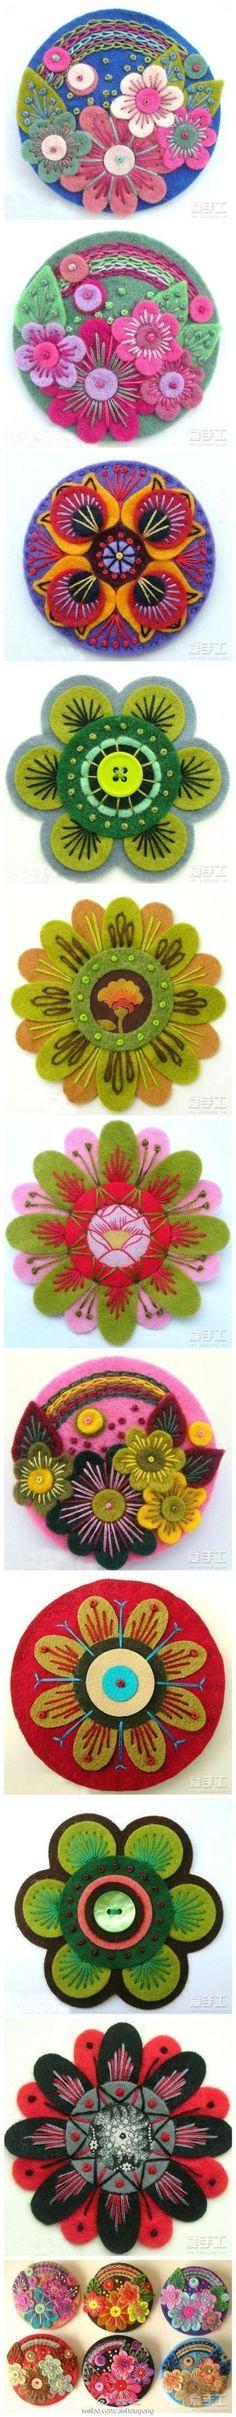 Fieltro flores - Felt flowers - Picmia